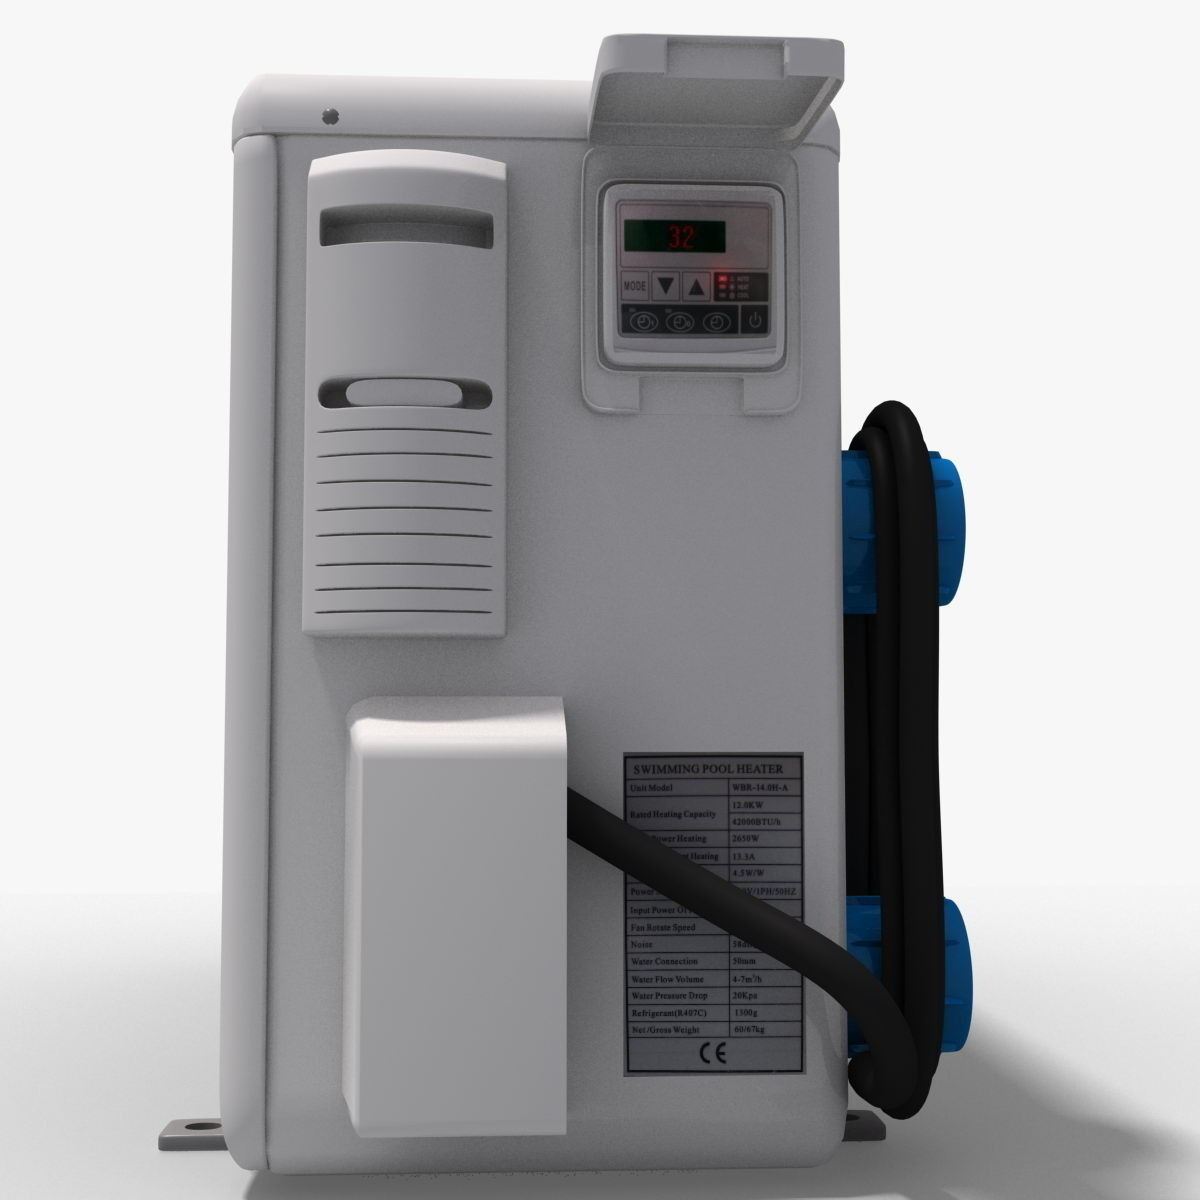 Water Boiler Model ~ Water heater d model max obj cgtrader